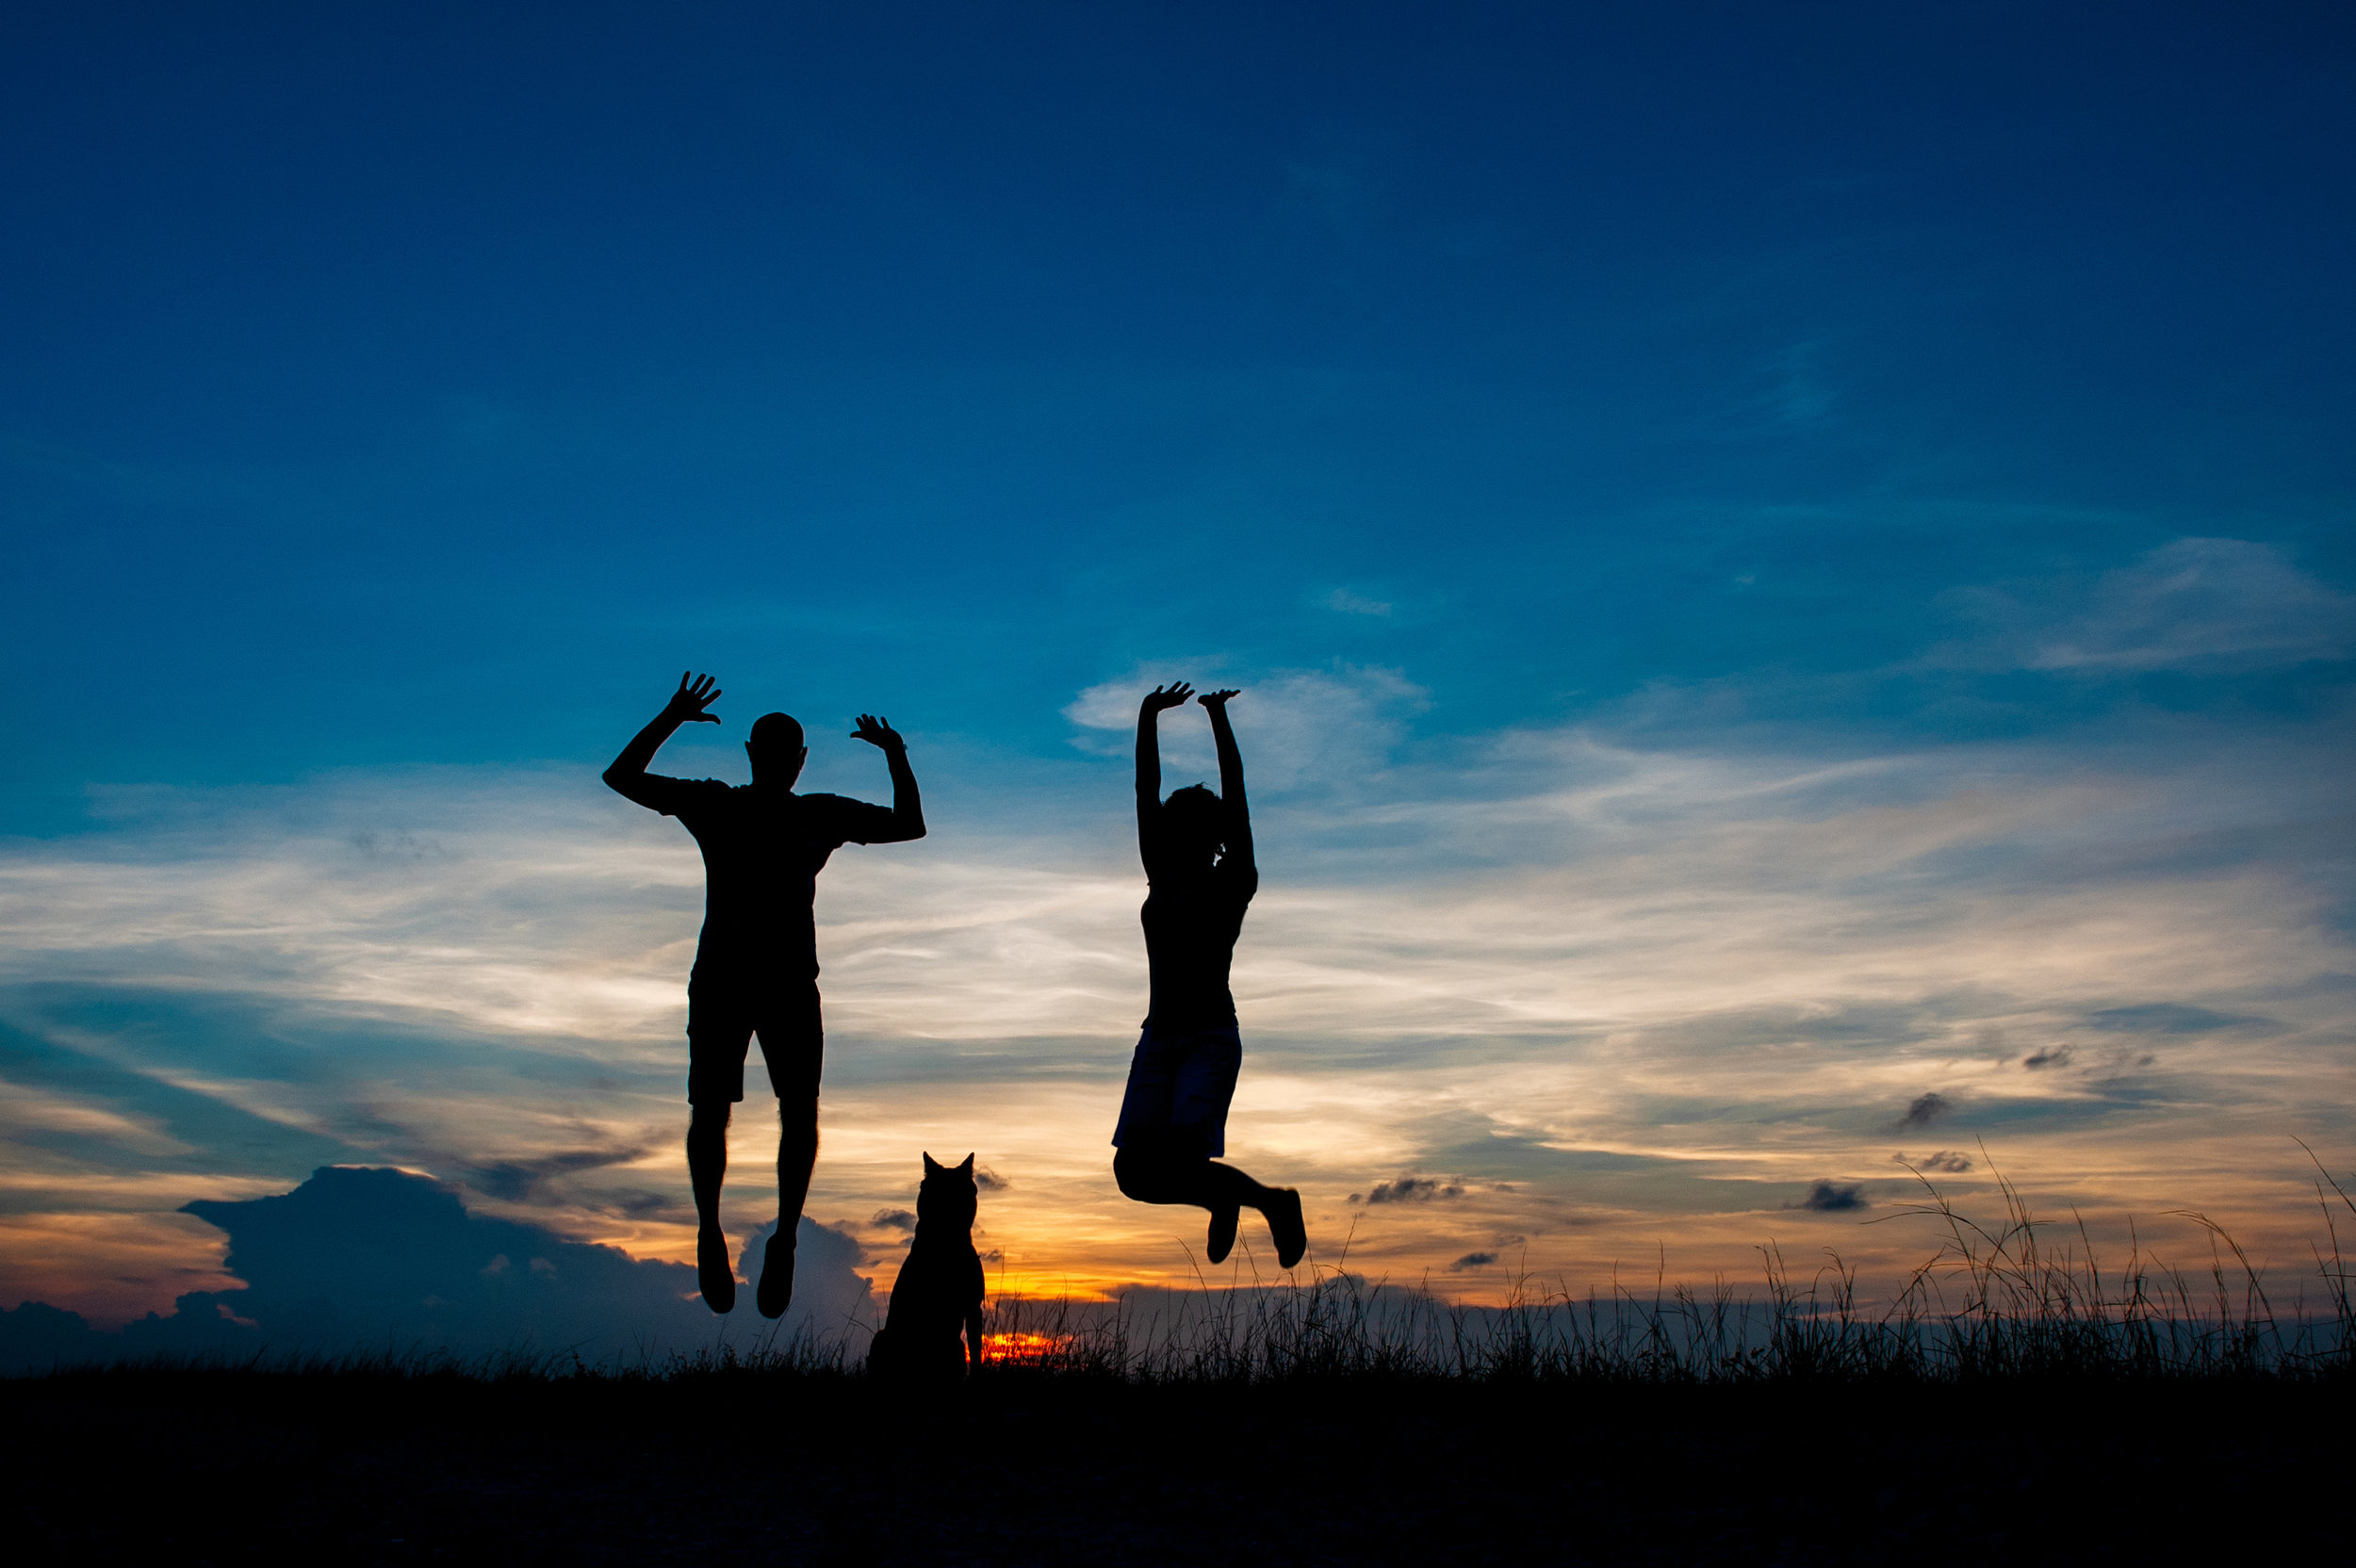 Paola-Paladini-Sunset-Silhouettes-Dog-Couple-Jump